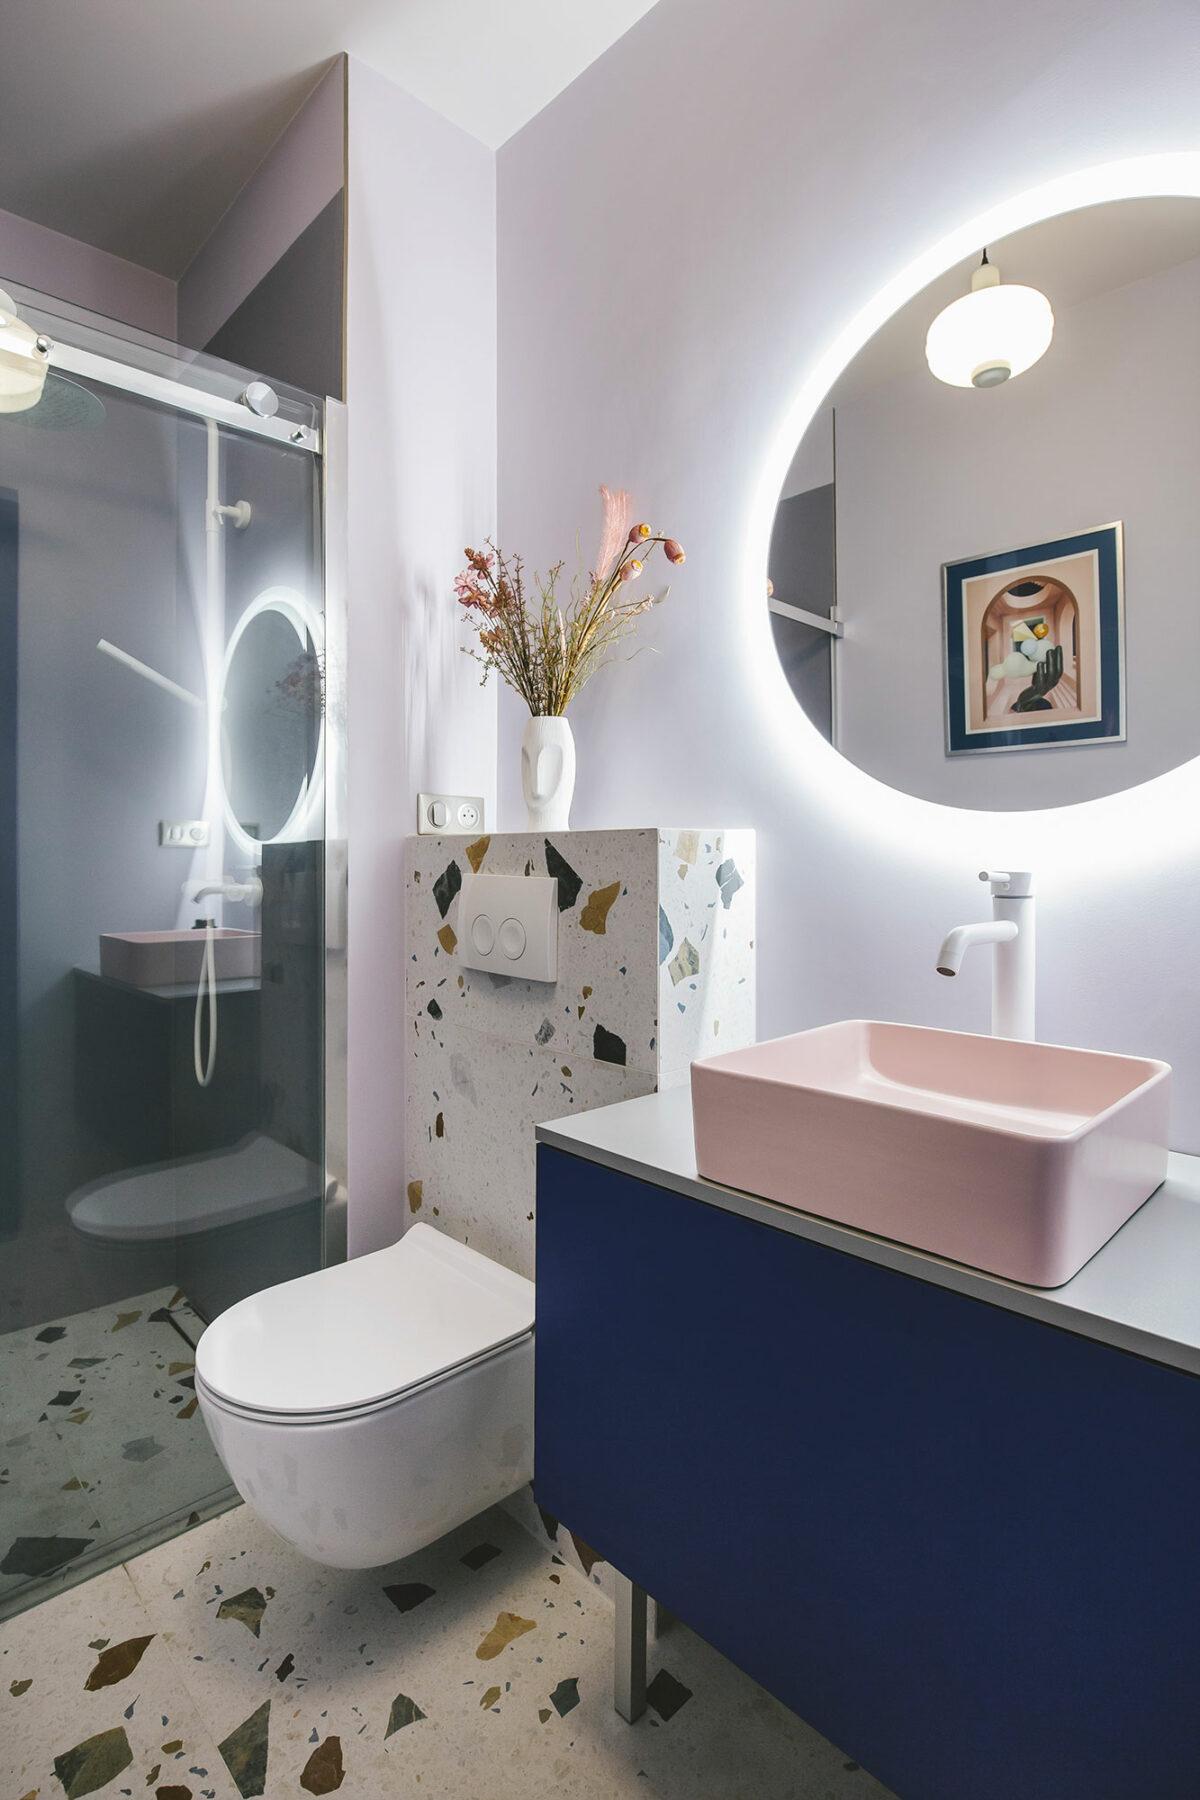 salle de bain wc terrazzo rose bleu klein design - blog déco - clem around the corner